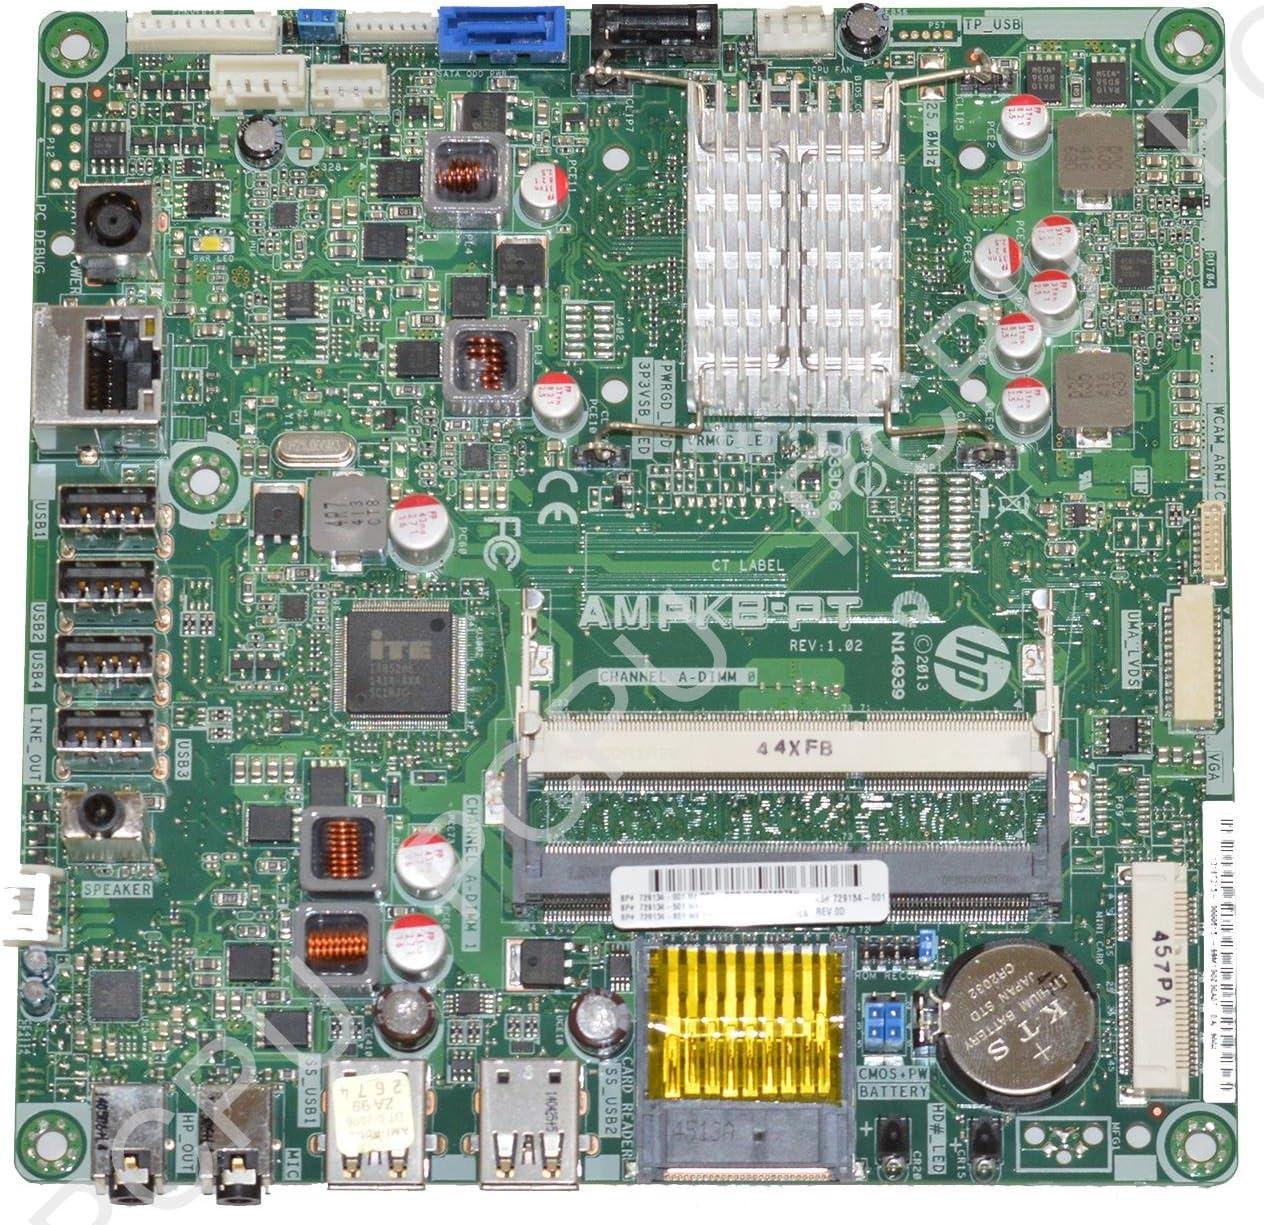 729134-001 HP TS 19 Daisy Kabini AIO Motherboard w//AMD E1-2500 1.4GHz CPU